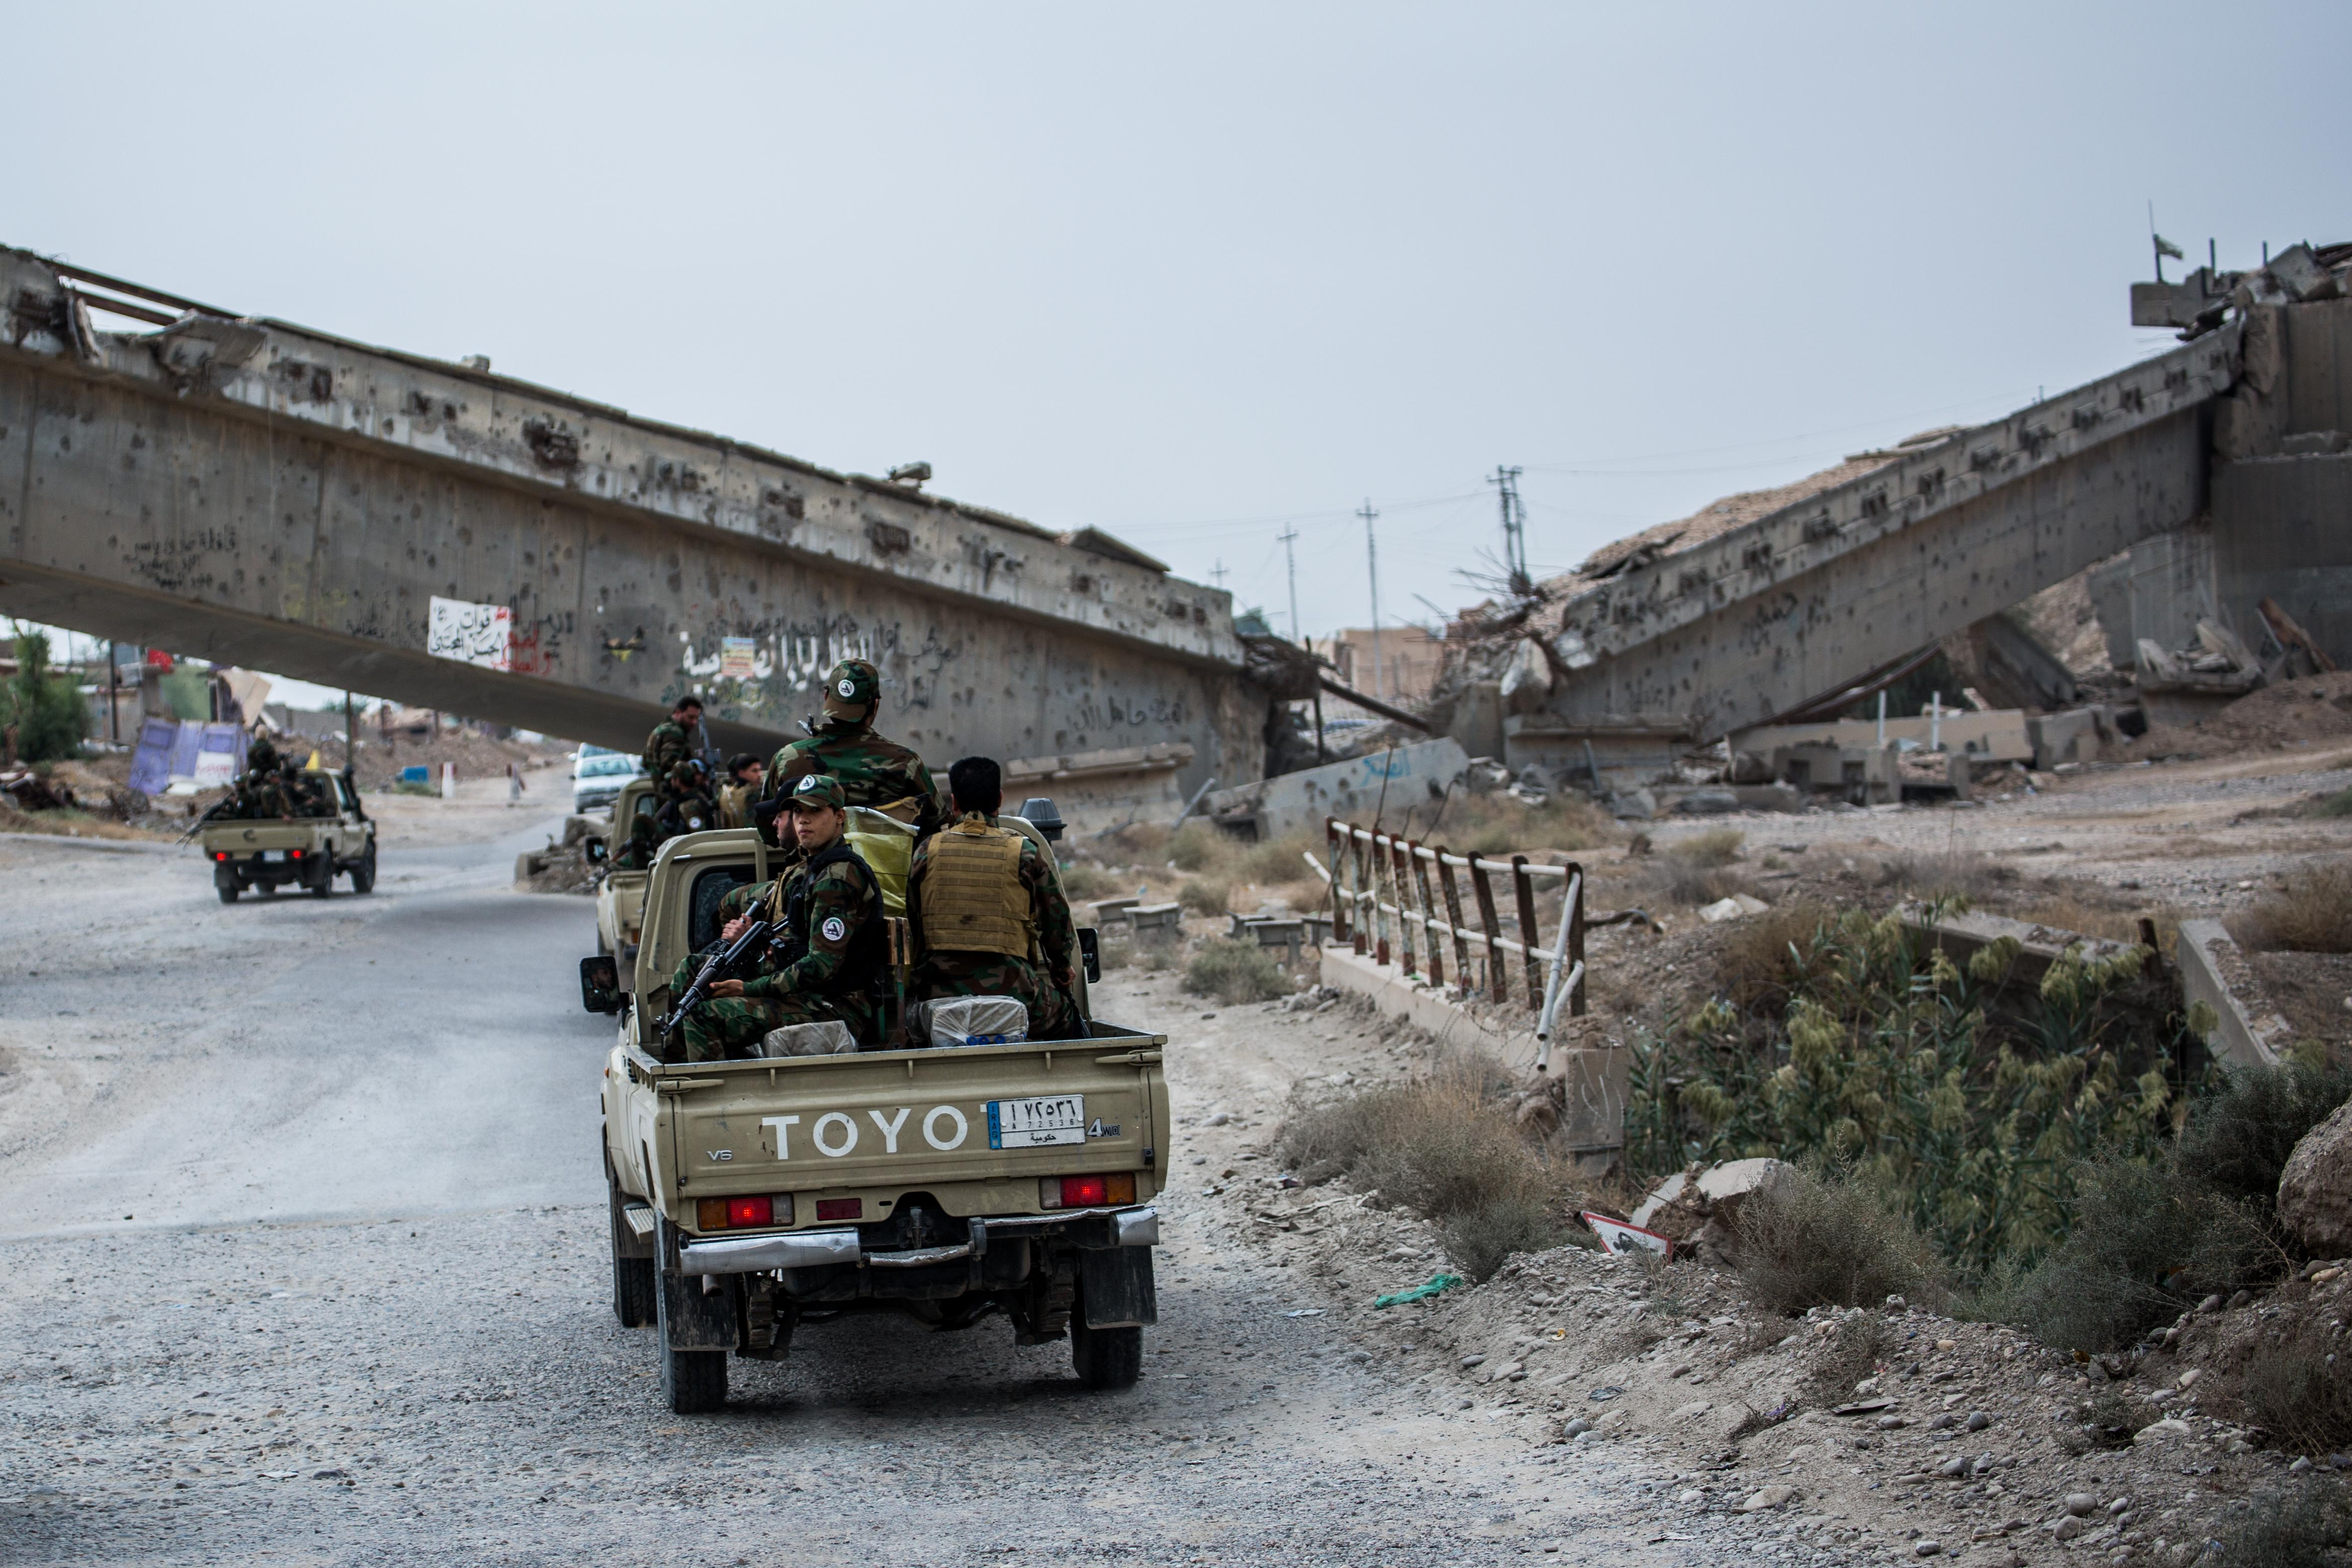 <p><em><strong>Baiji, Iraq  </strong> </em>Units of the Shia unit Hashd al-Schaabi pass a bridge that ISIS blew up during their retreat. (Photo: Sebastian Backhaus) </p>